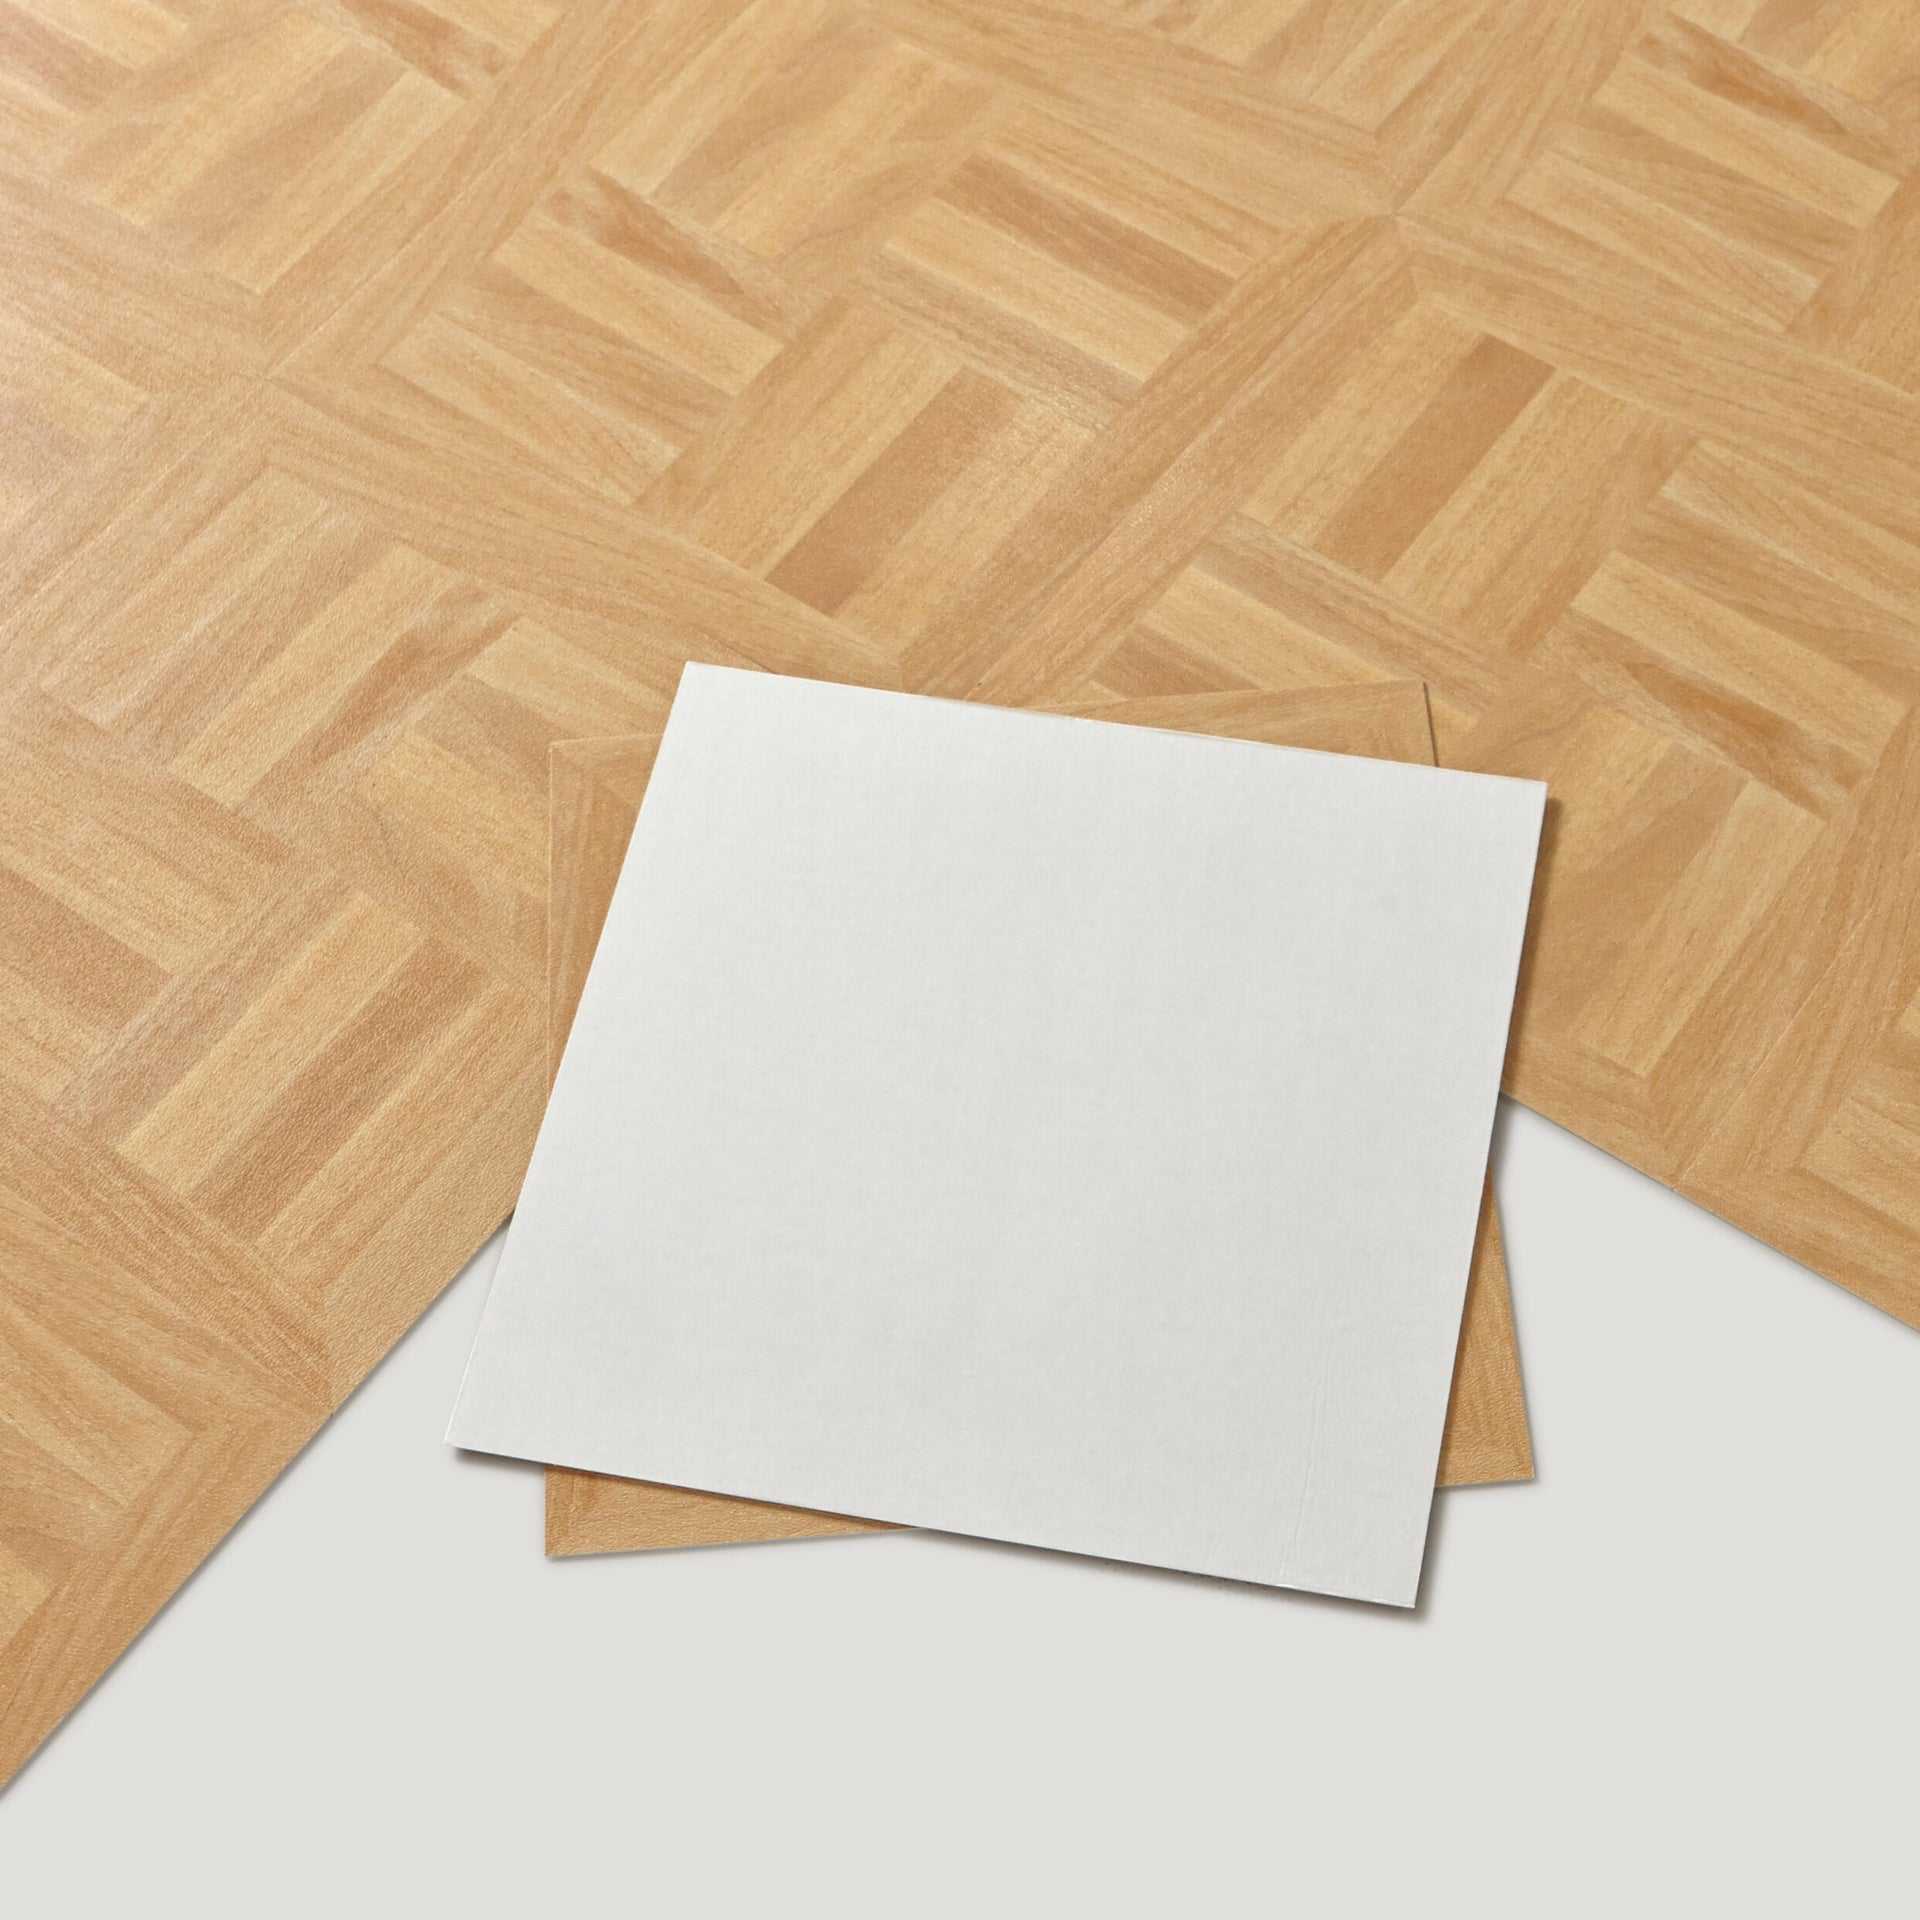 Pavimento PVC adesivo Dugan Sp 1.2 mm giallo / dorato - 5